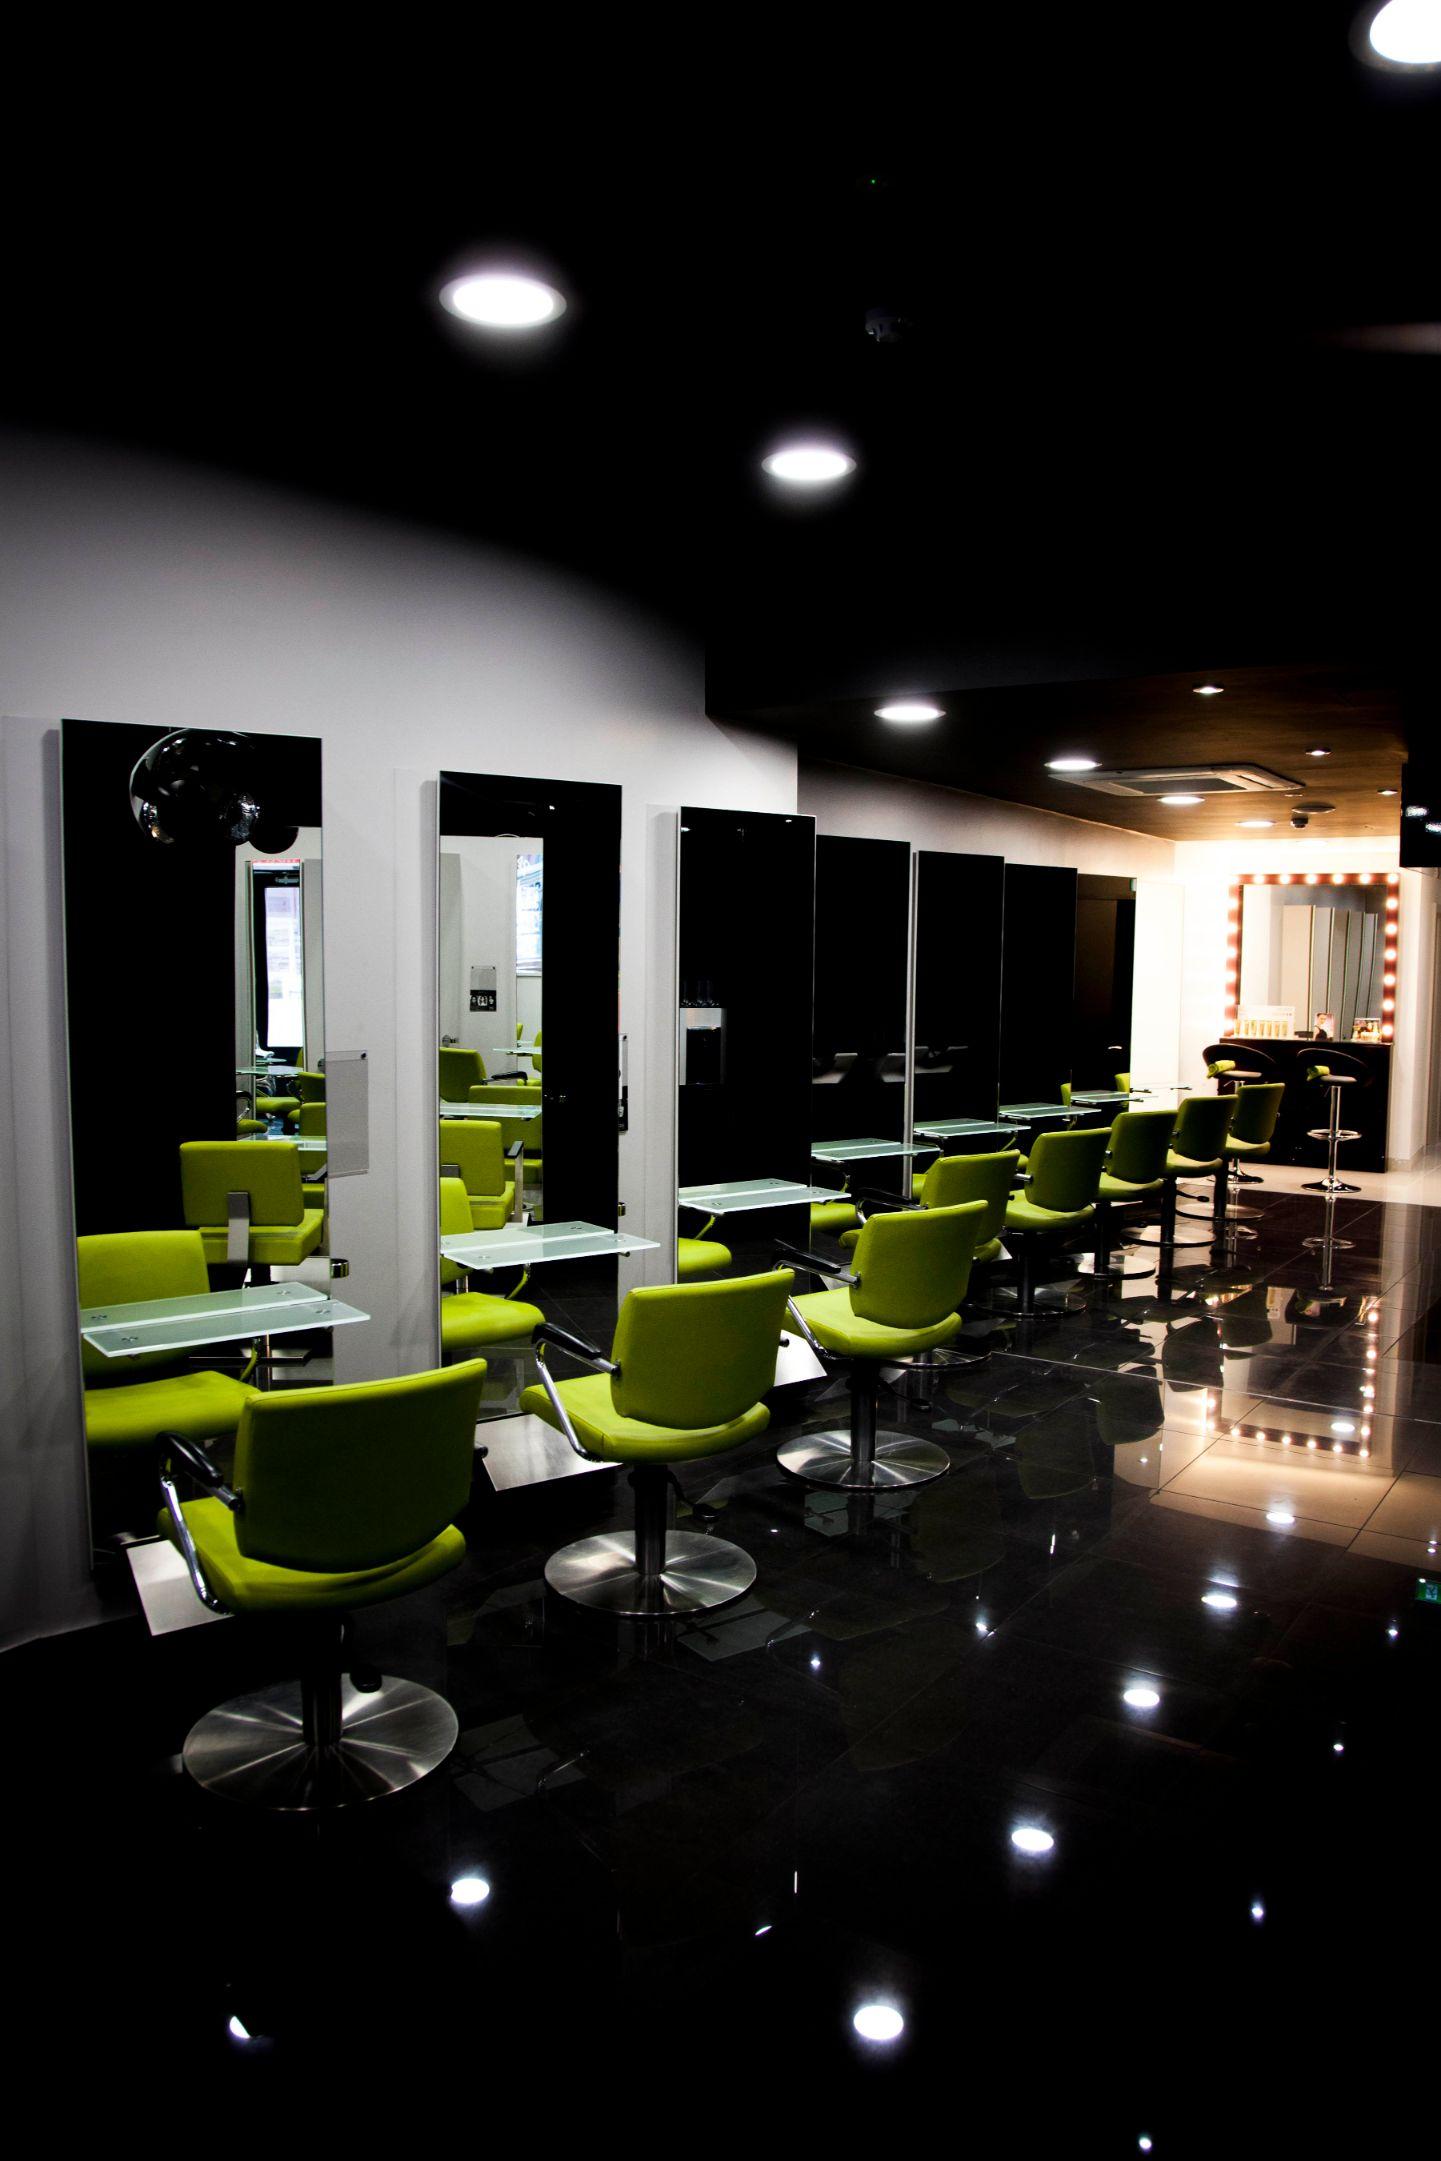 allure hair and beauty salon green chair